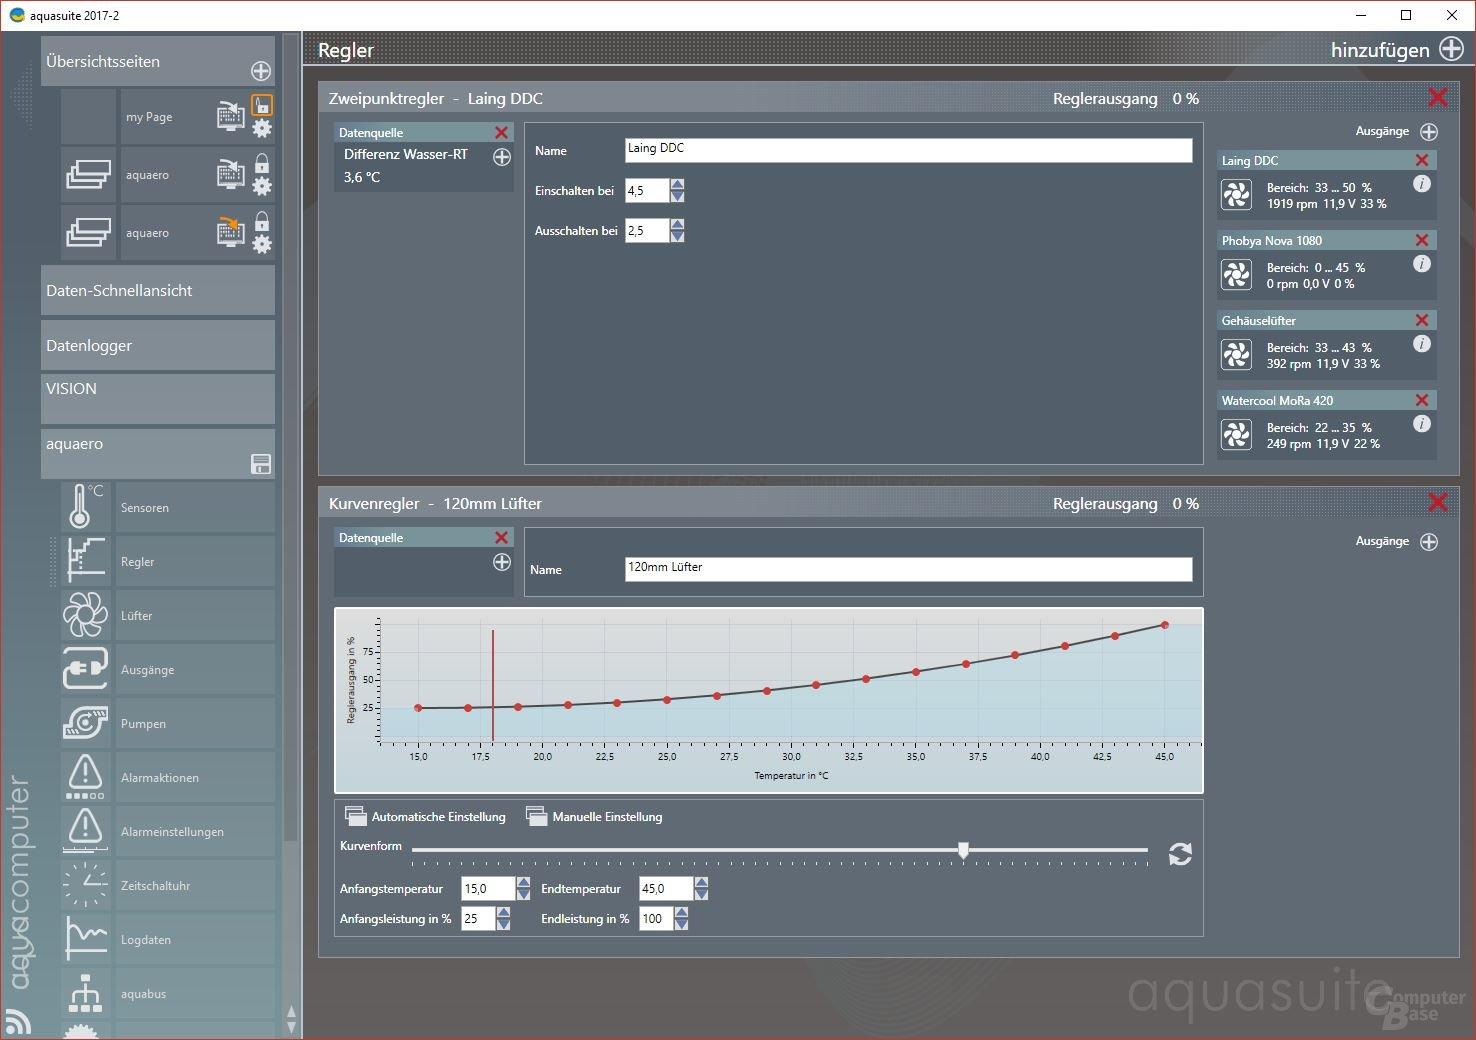 Aqua Computer Aquaero 6 LT: Programmierung von Lüfterkurven